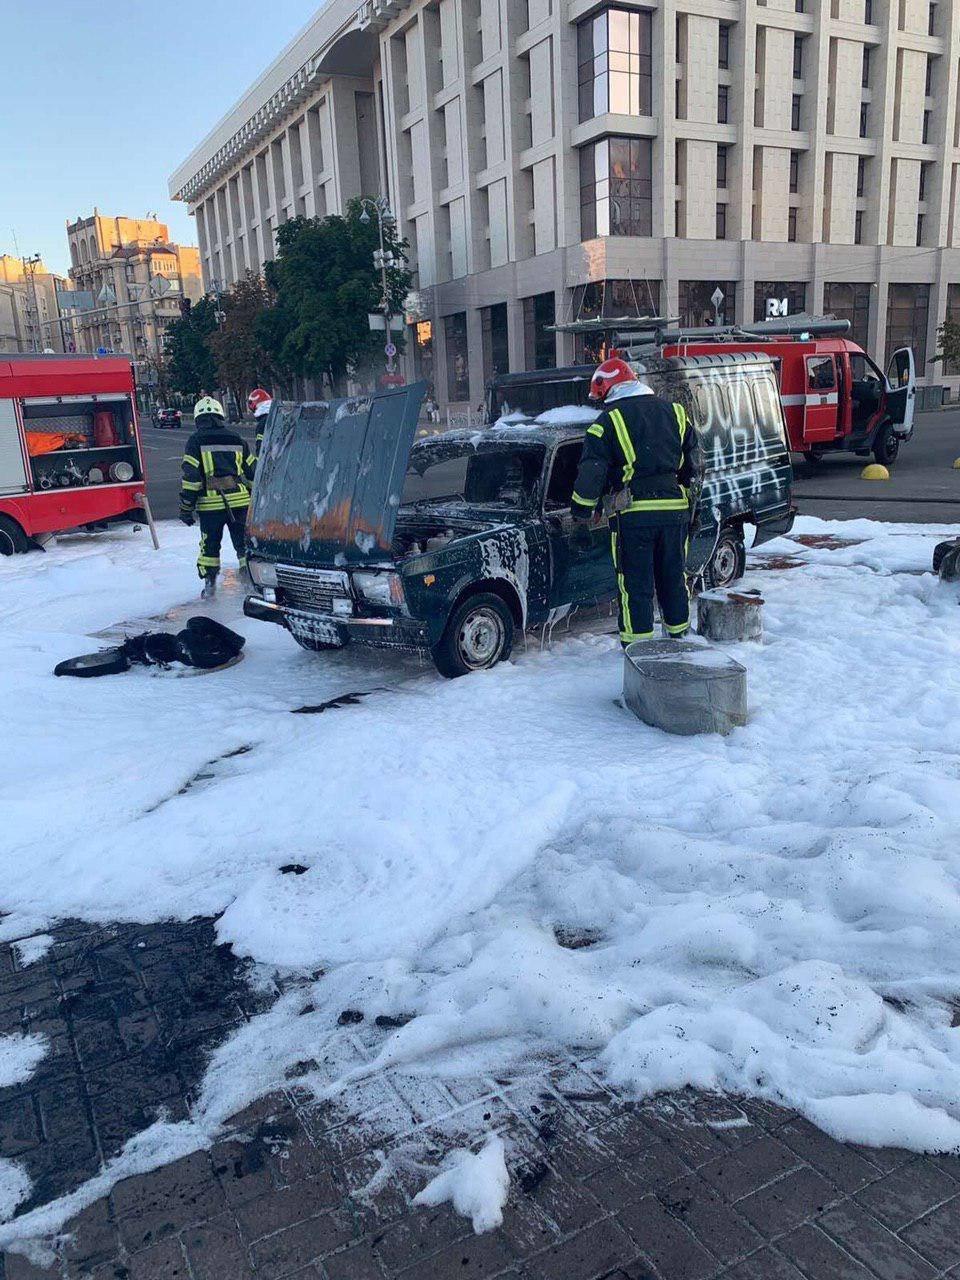 В центре Киева мужчина поджог автомобиль, - ВИДЕО, фото-3